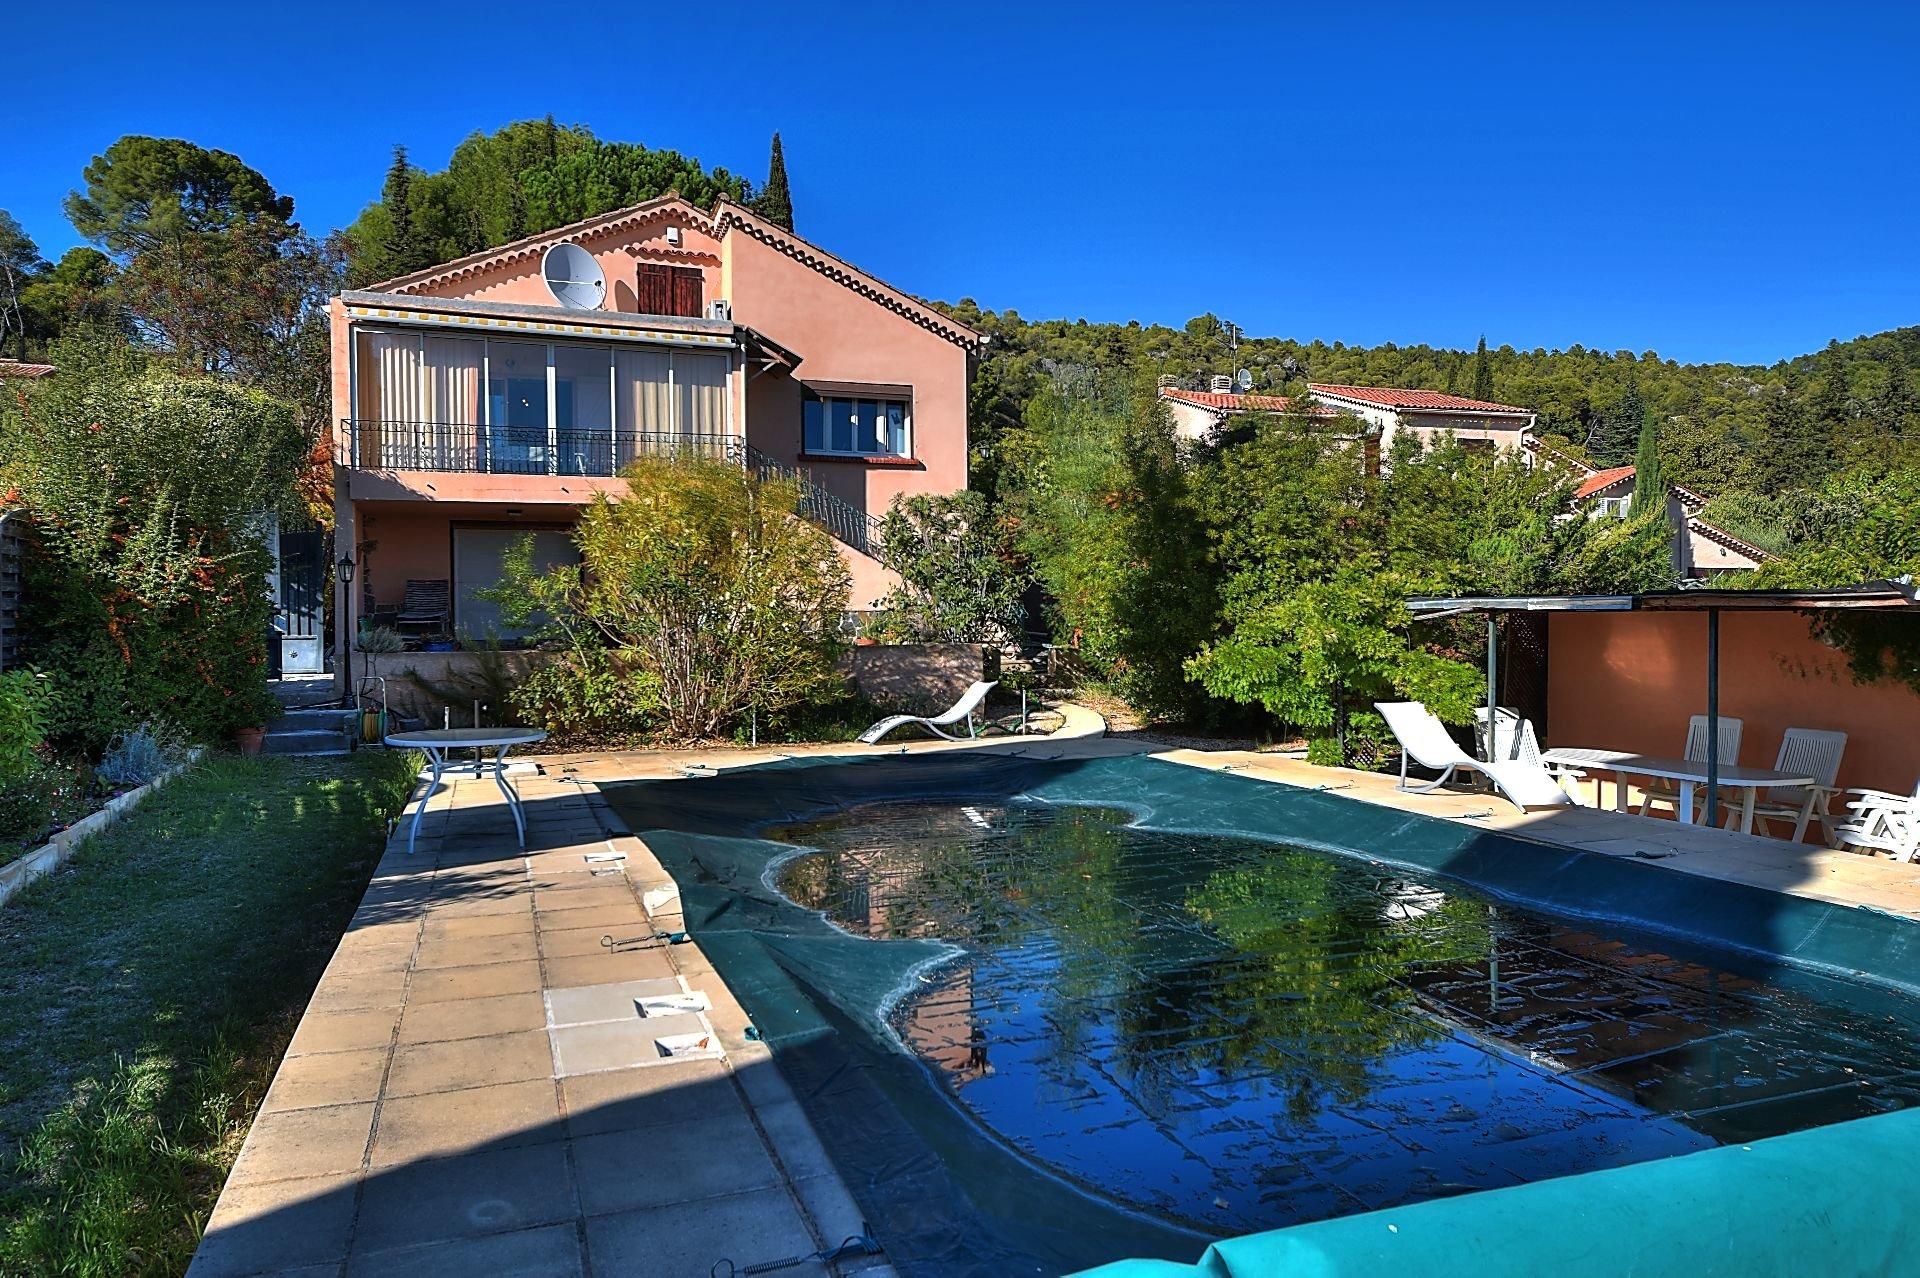 Villa avec studio indépendant piscine, Villecroze, Var